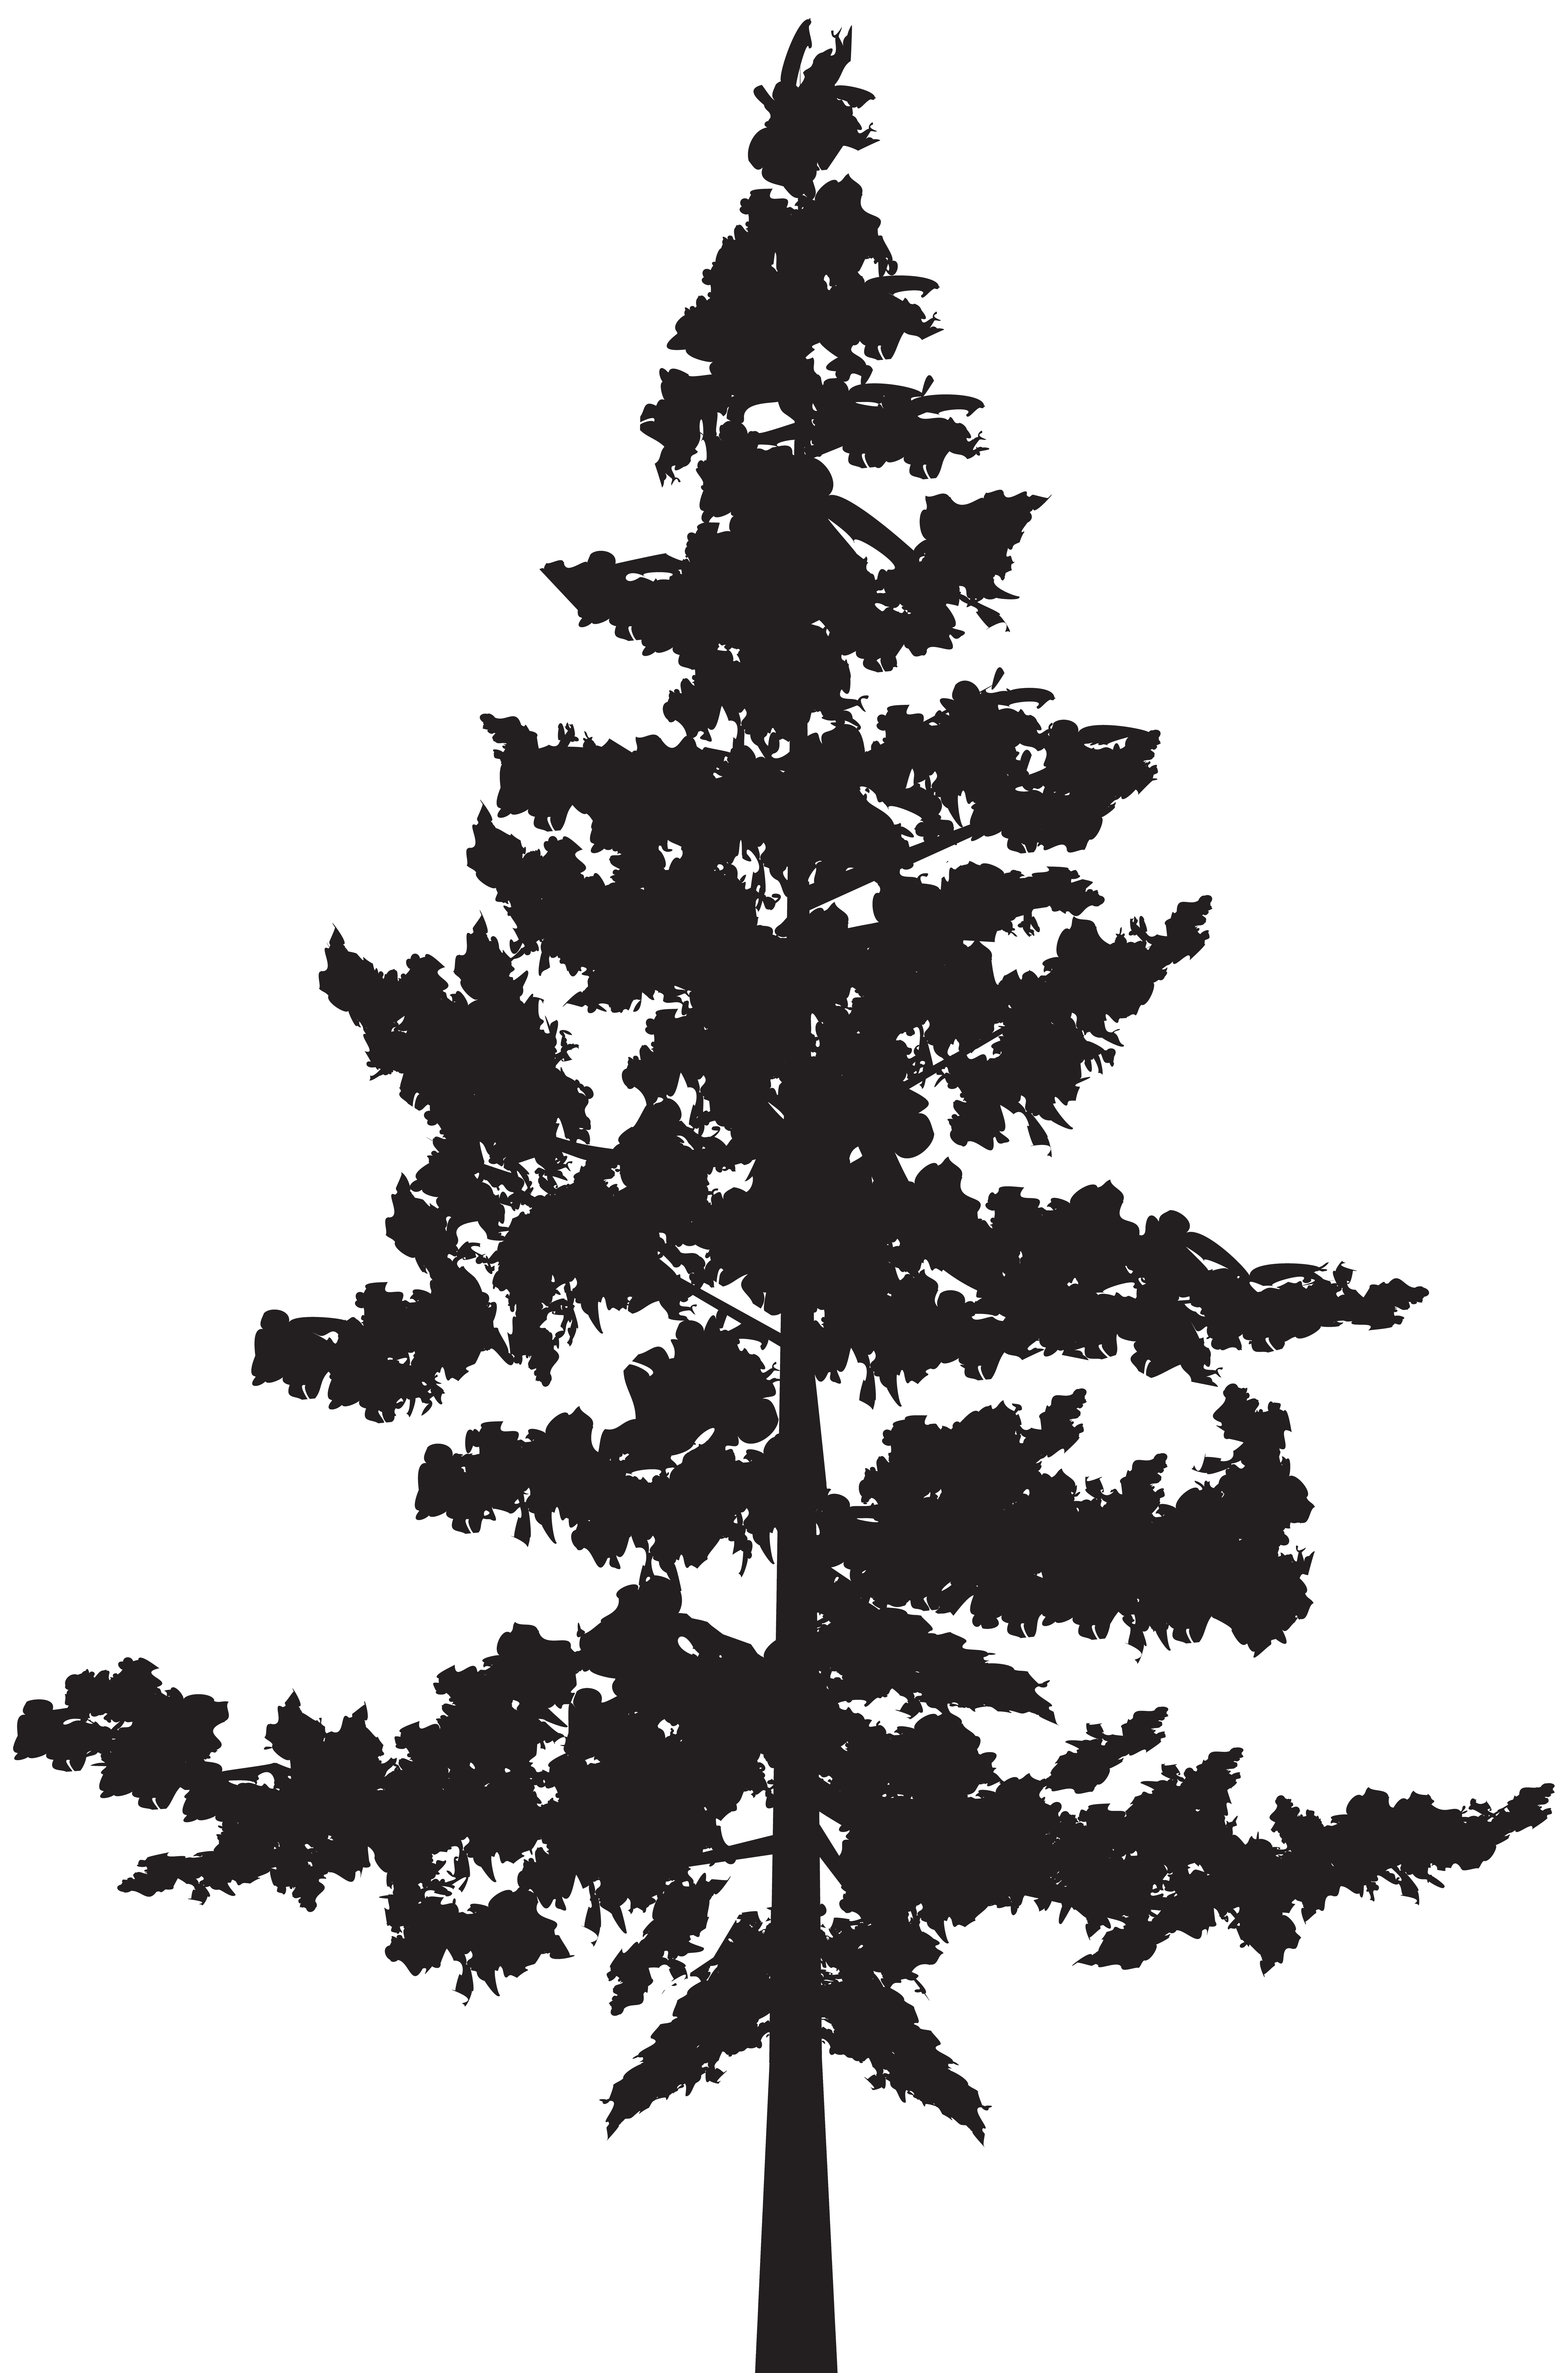 Pine silhouette clipart black and white svg transparent stock Black pine Tree Pinus contorta - Tree PNG Silhouette Clip ... svg transparent stock